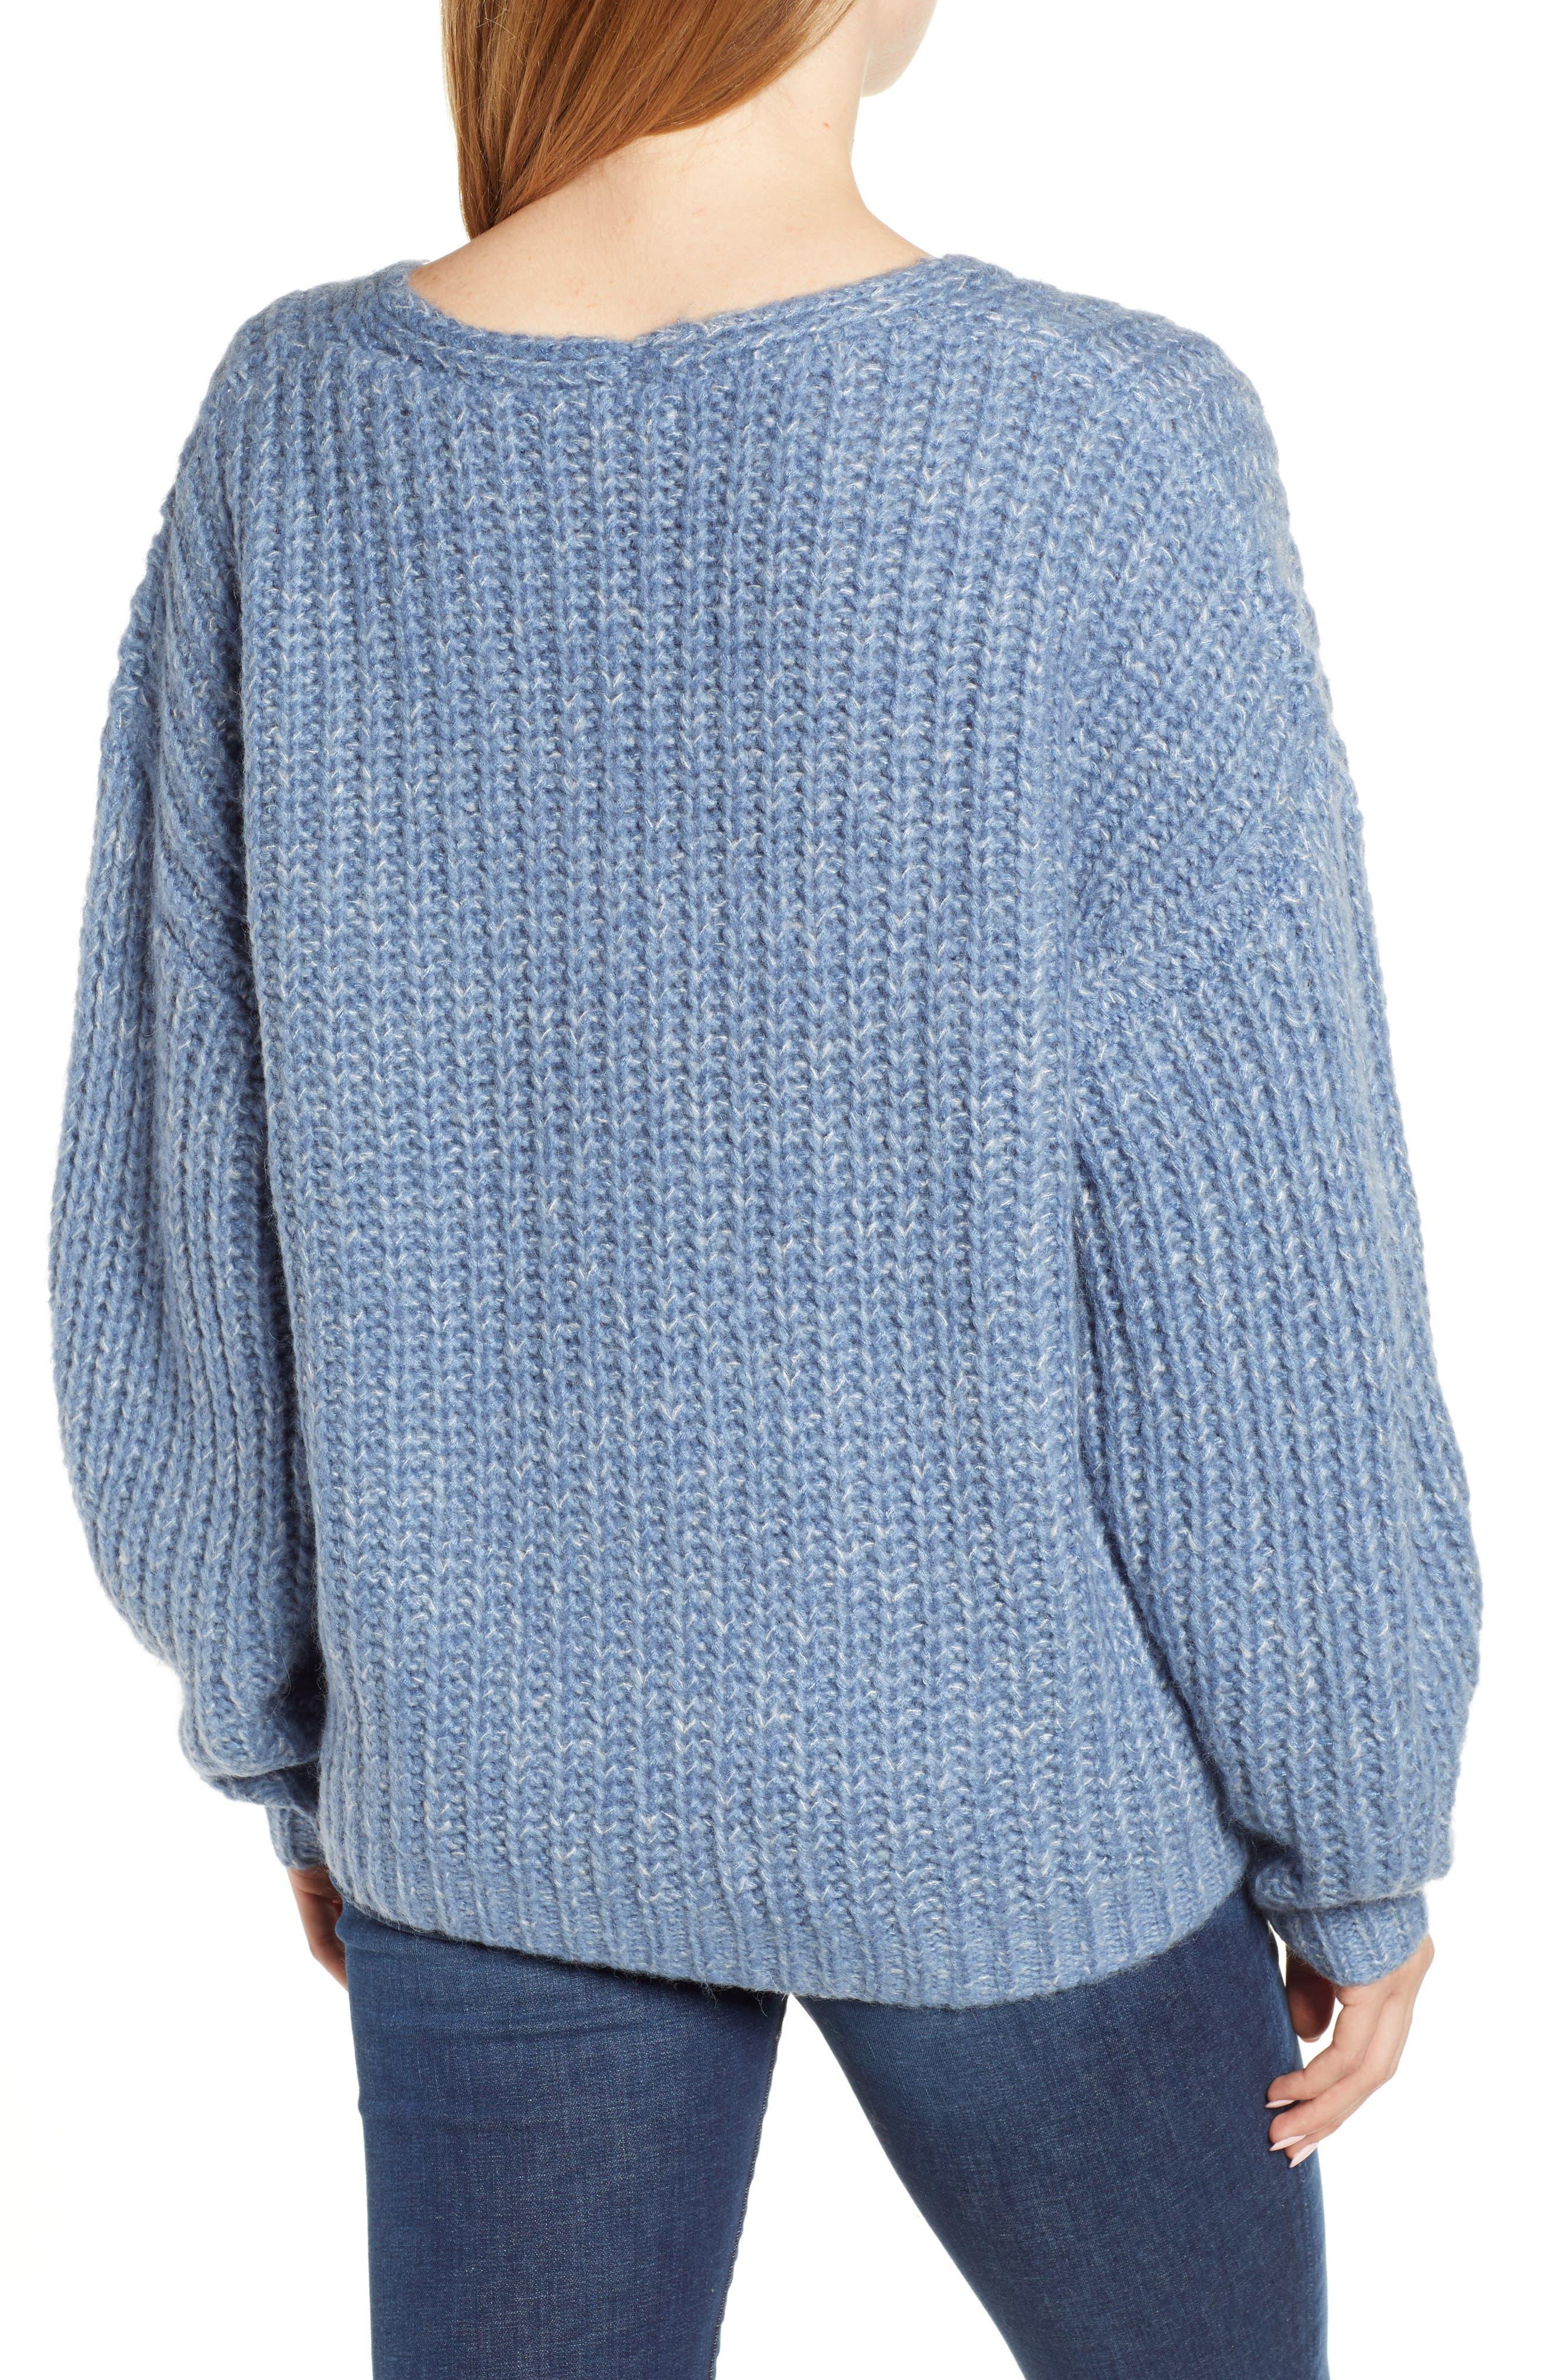 Dorit Sweater,                             Alternate thumbnail 2, color,                             BLUE